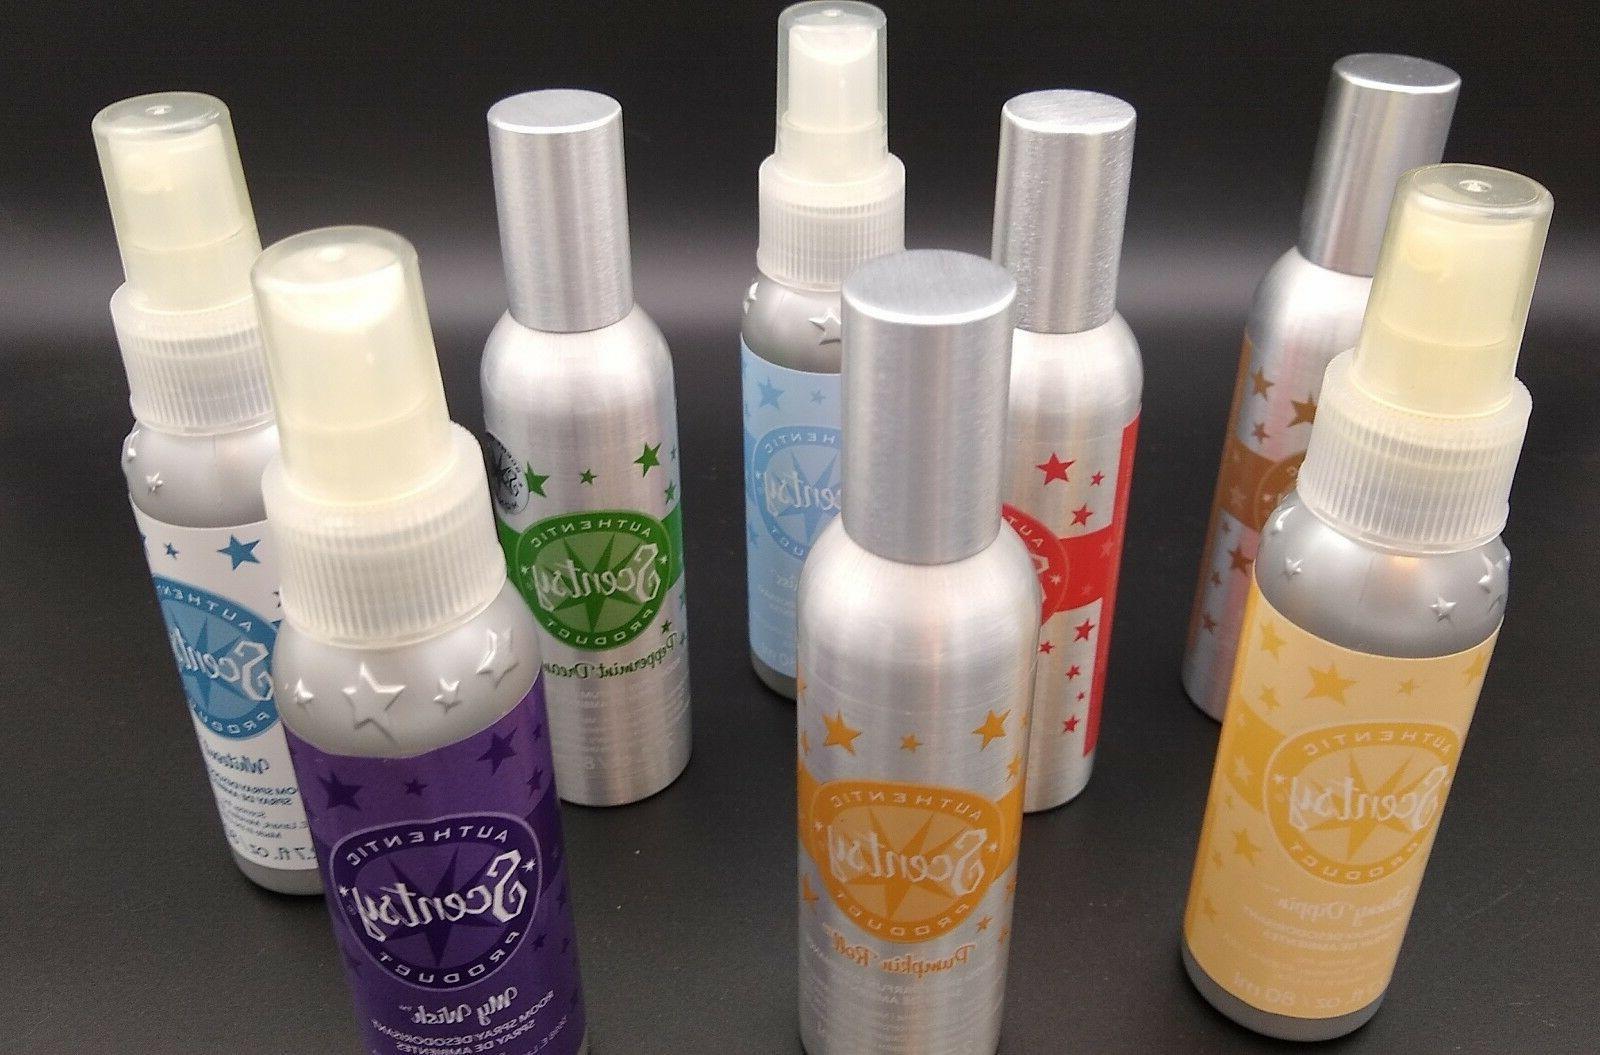 room spray 2 7 oz choose new